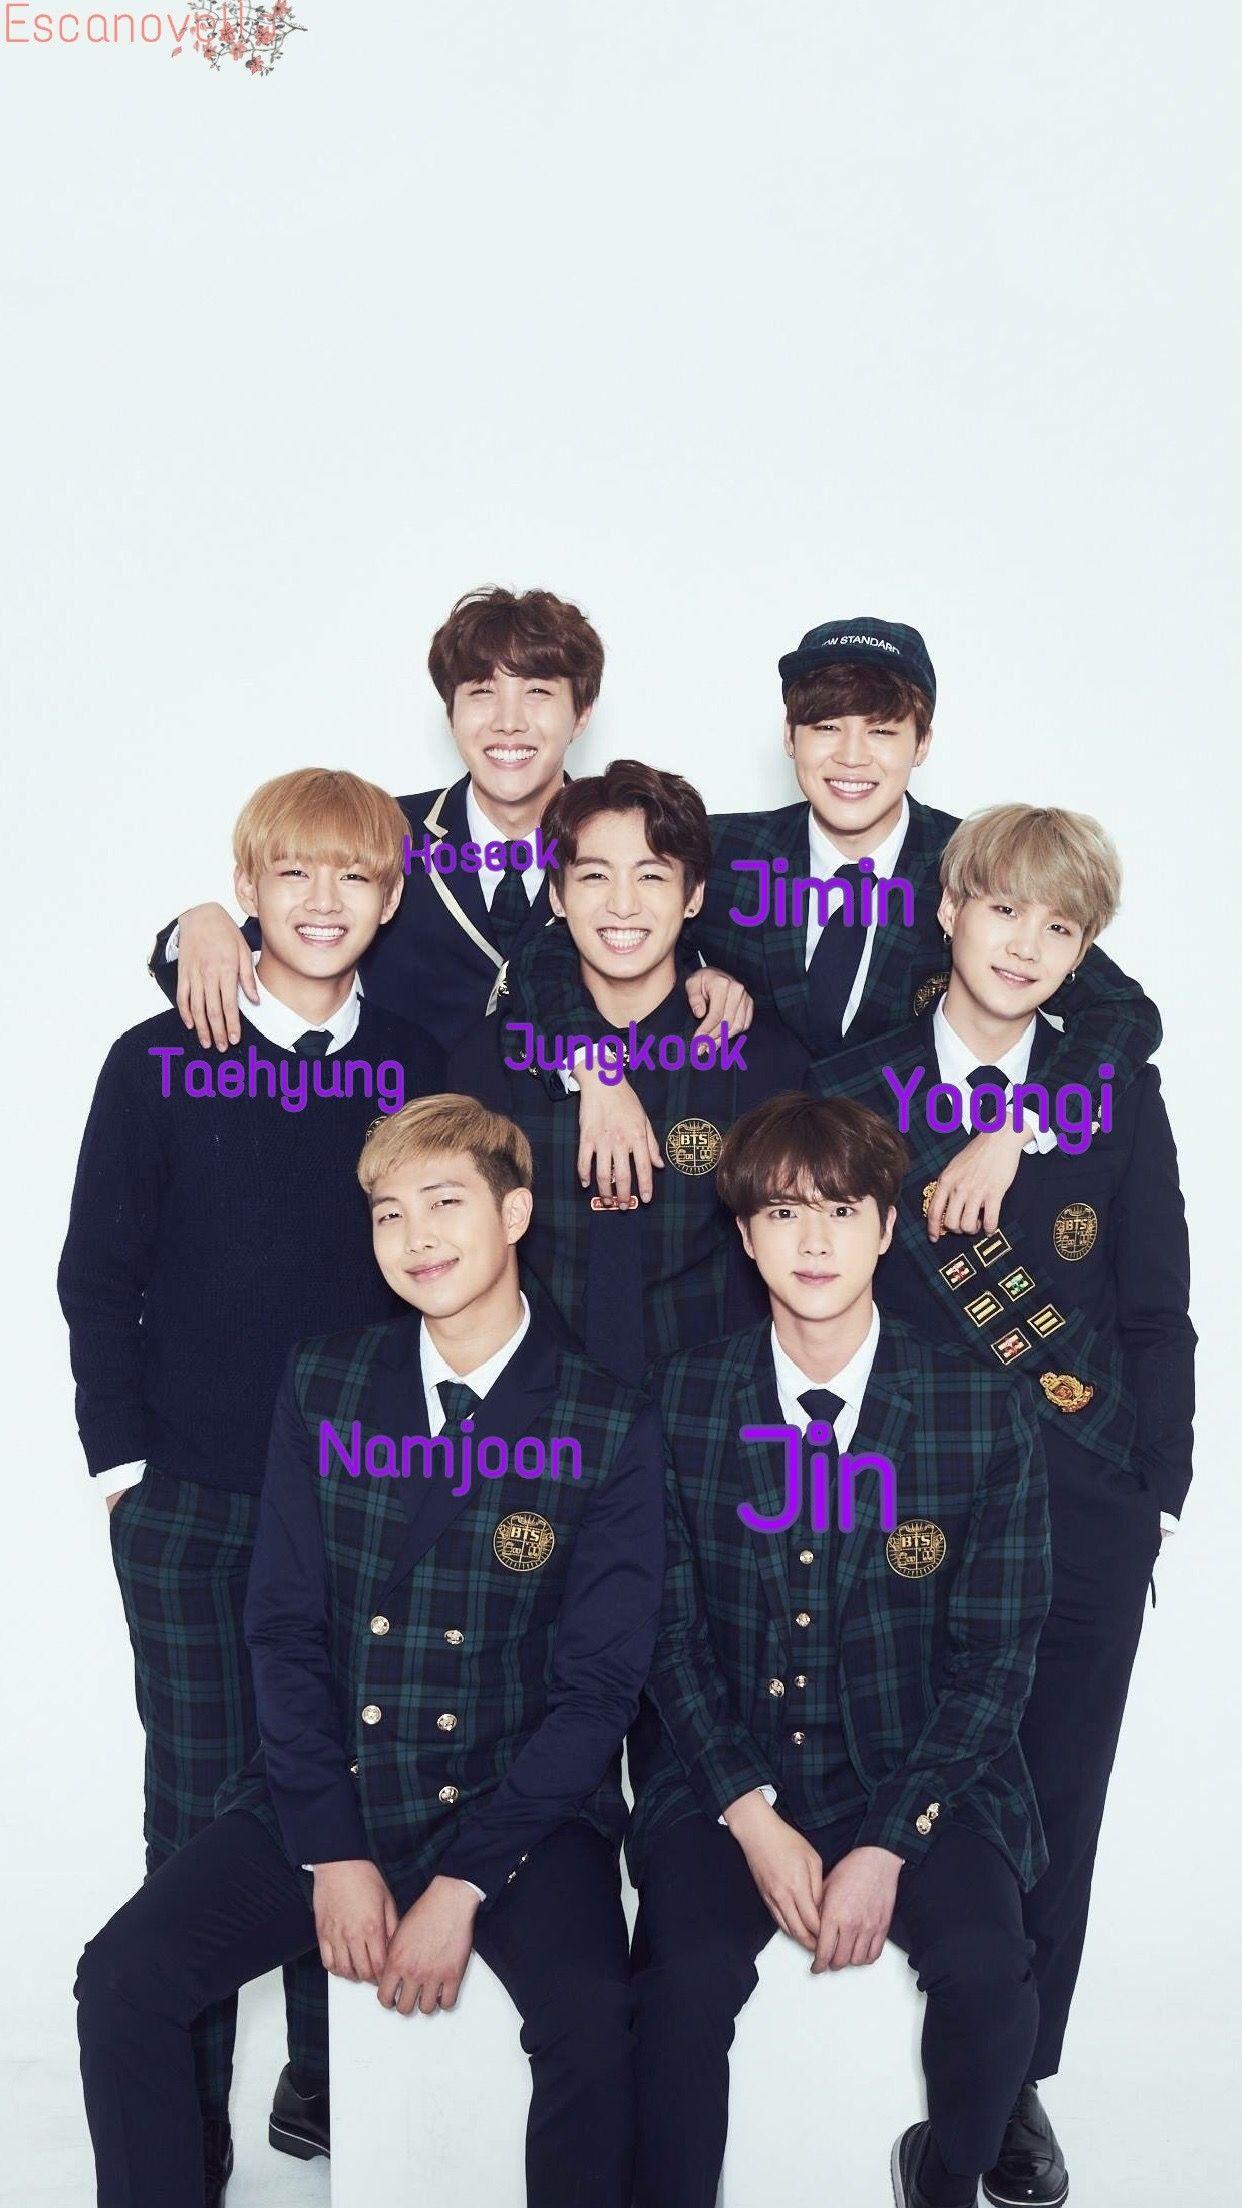 Pin By Stephanie Jimenez On Bts Cute Actors Bts Members Names Jimin Jungkook Wallpaper cute bts members